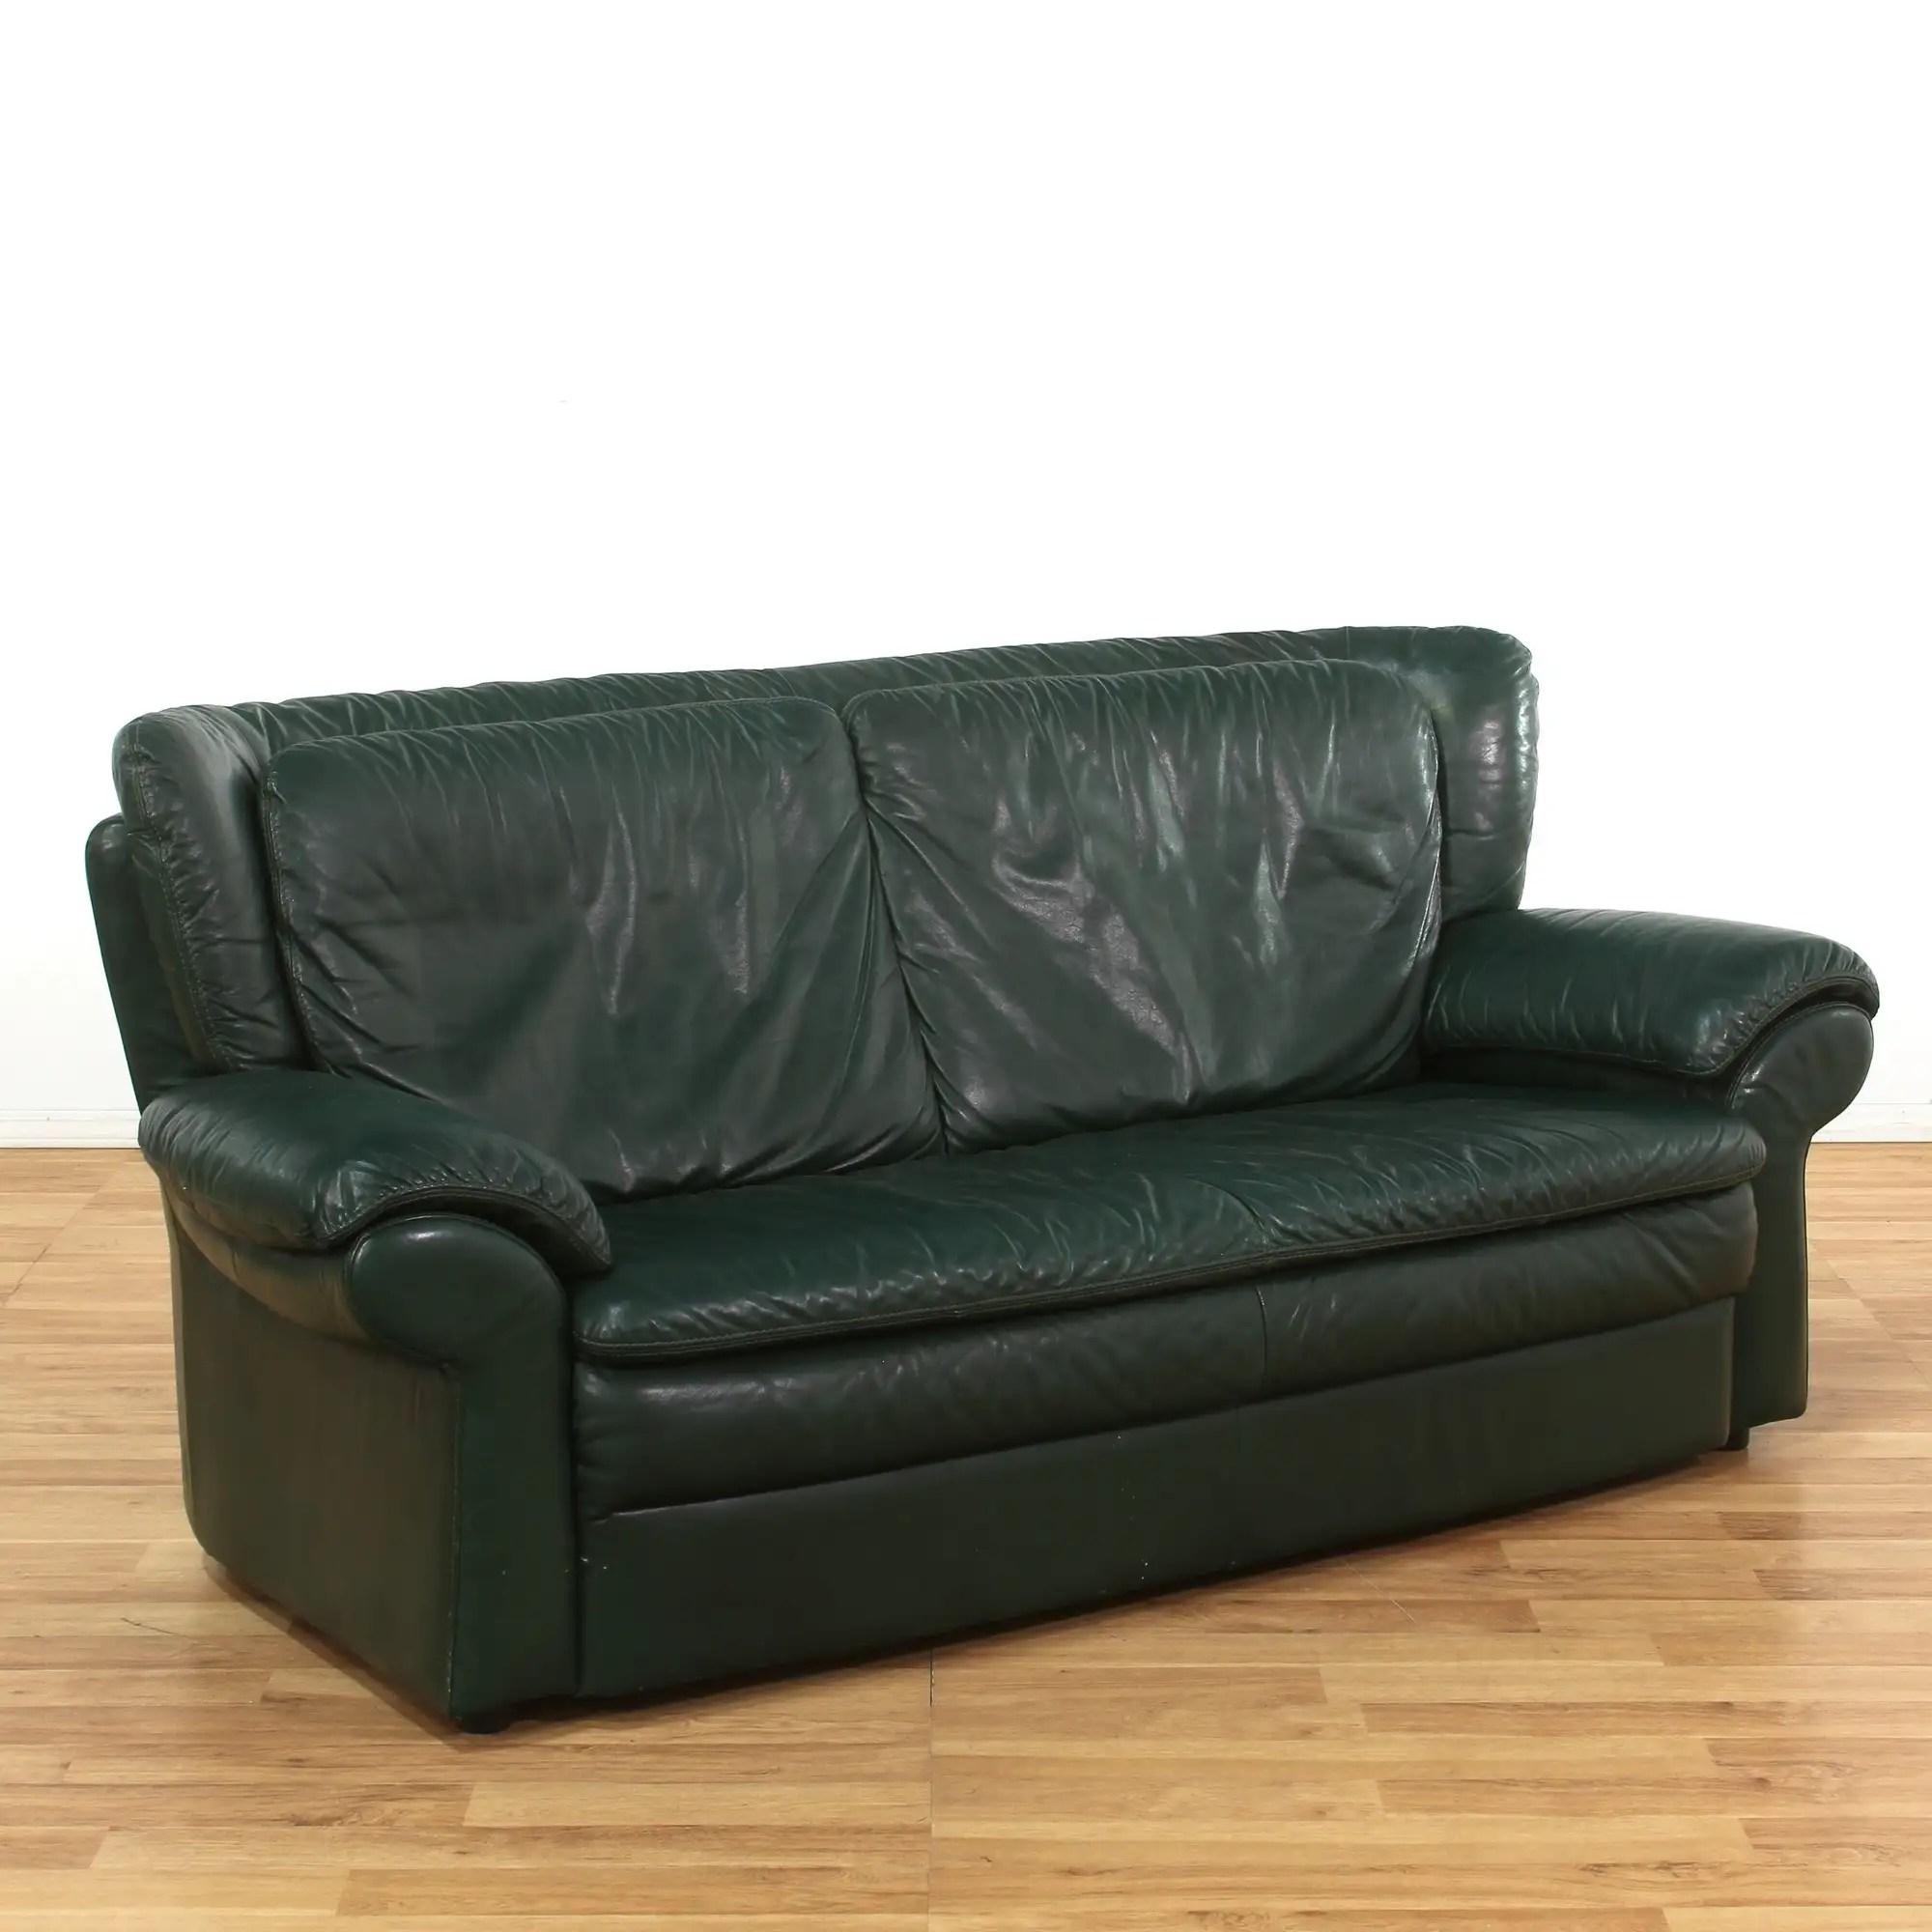 oversized dark green leather sofa